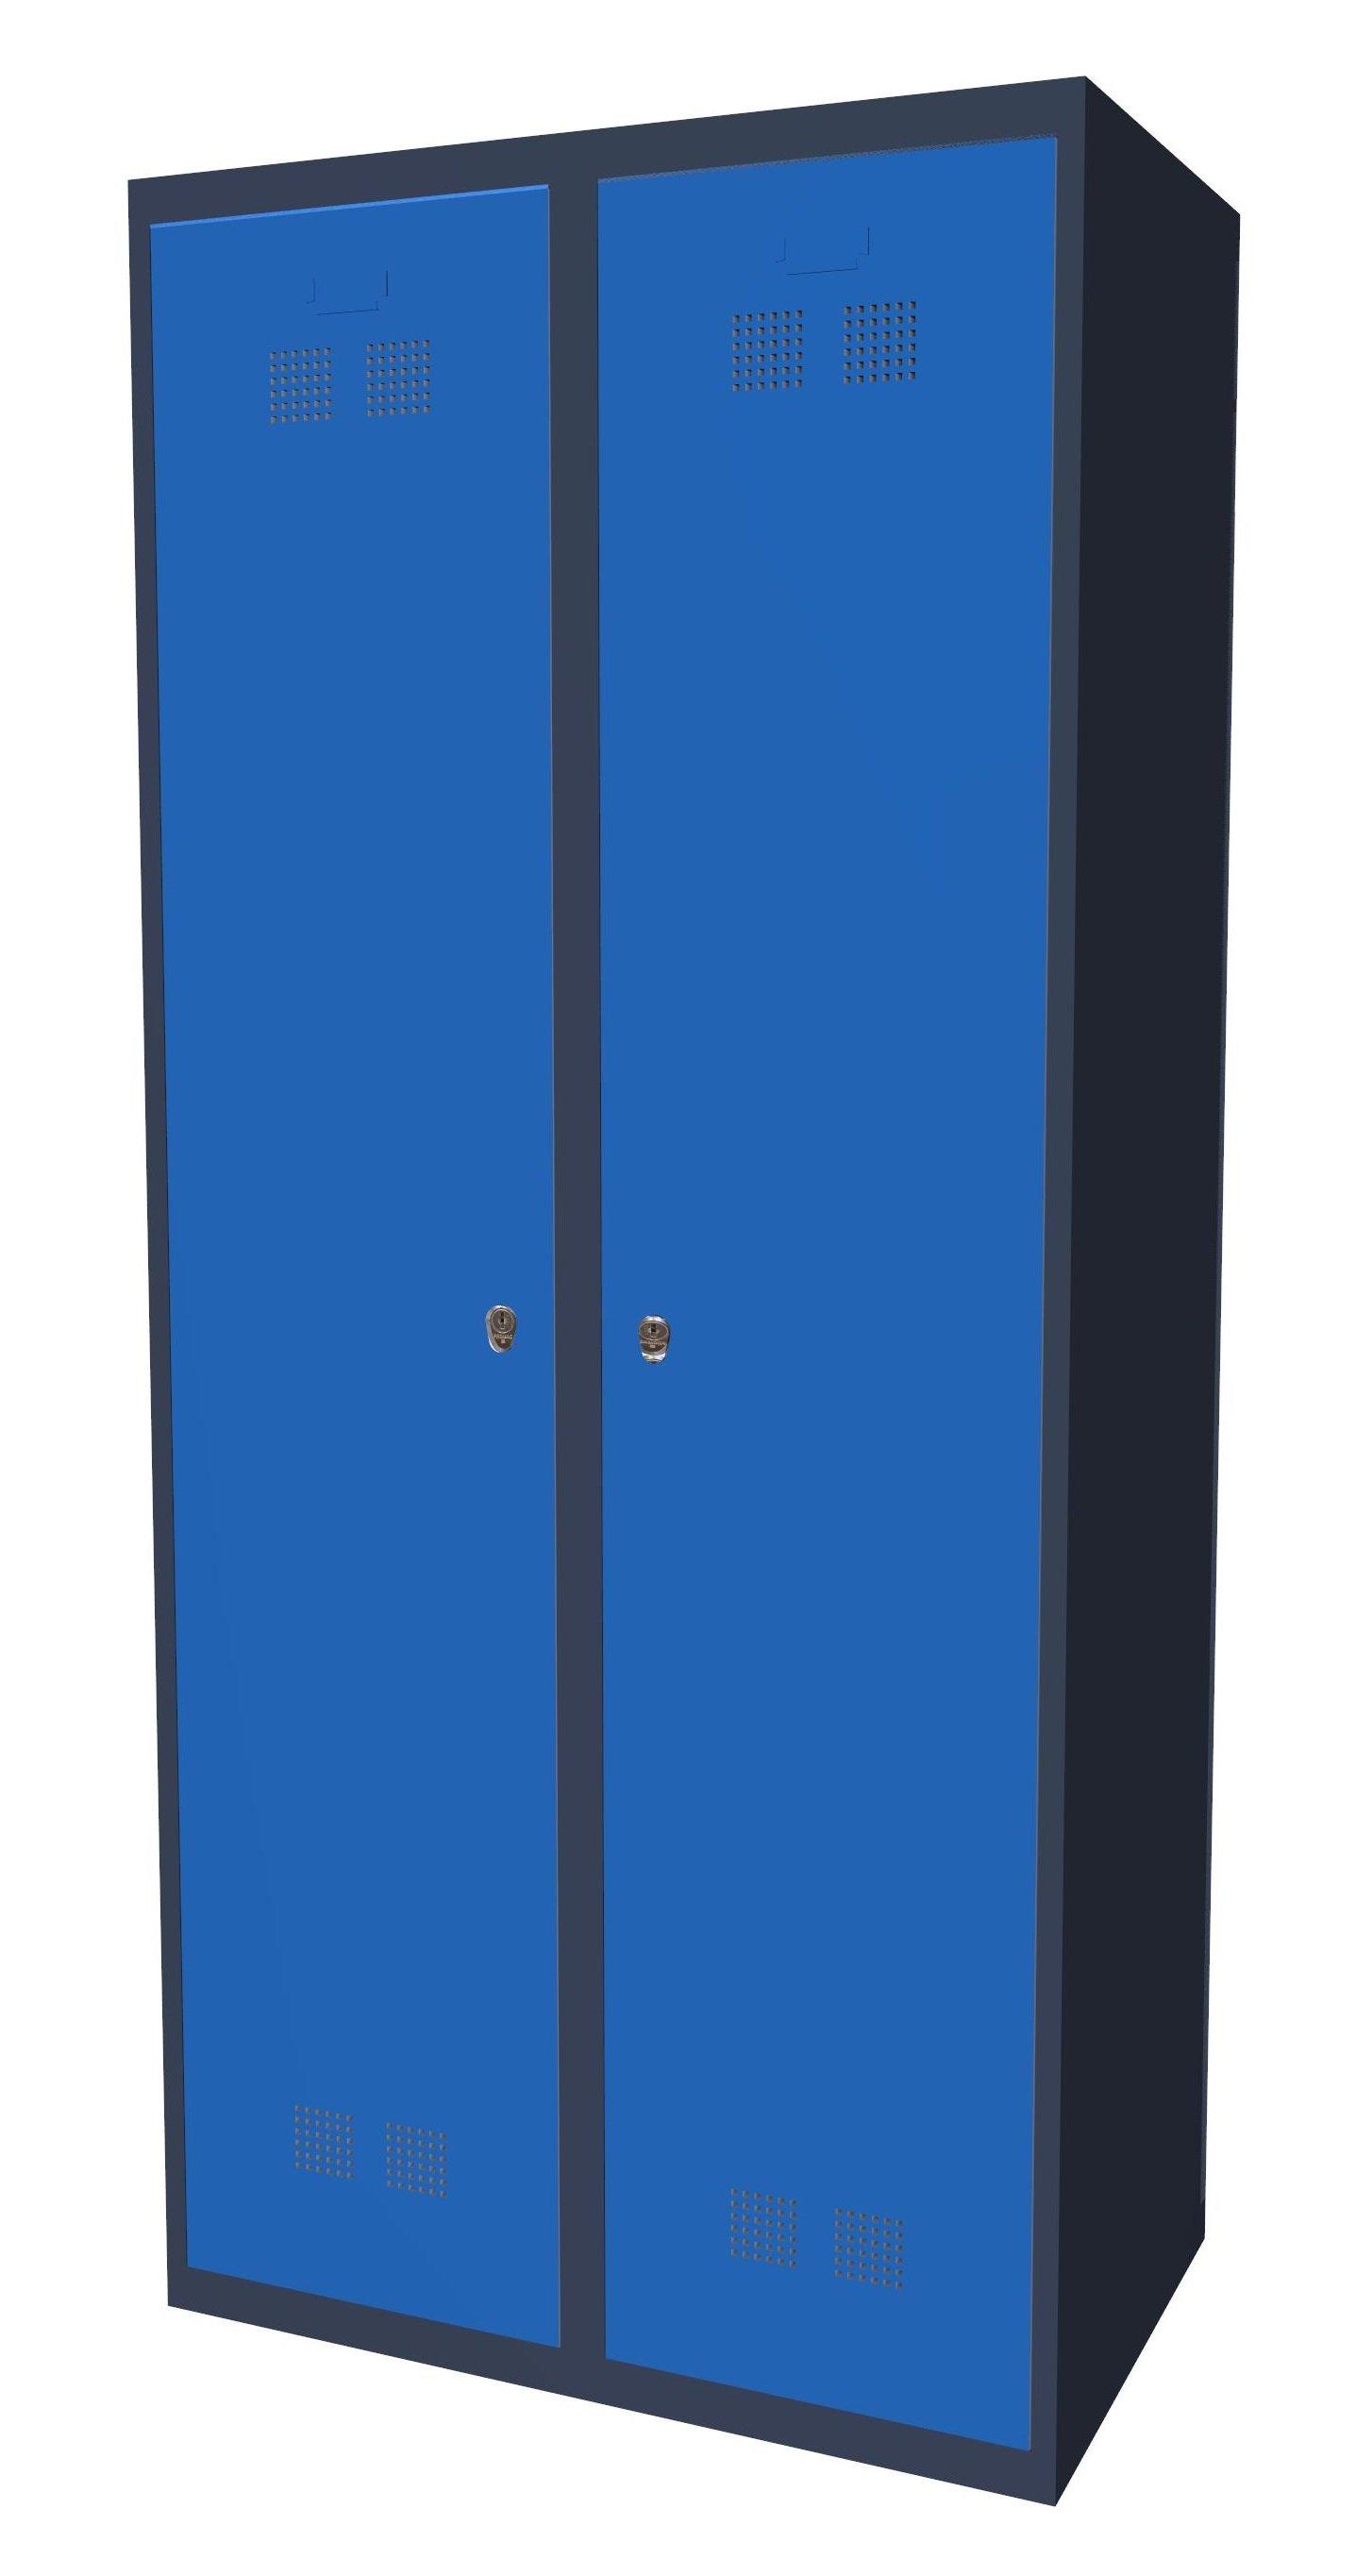 Szafka ubraniowa pracownicza SUP E400-02 7024/5015